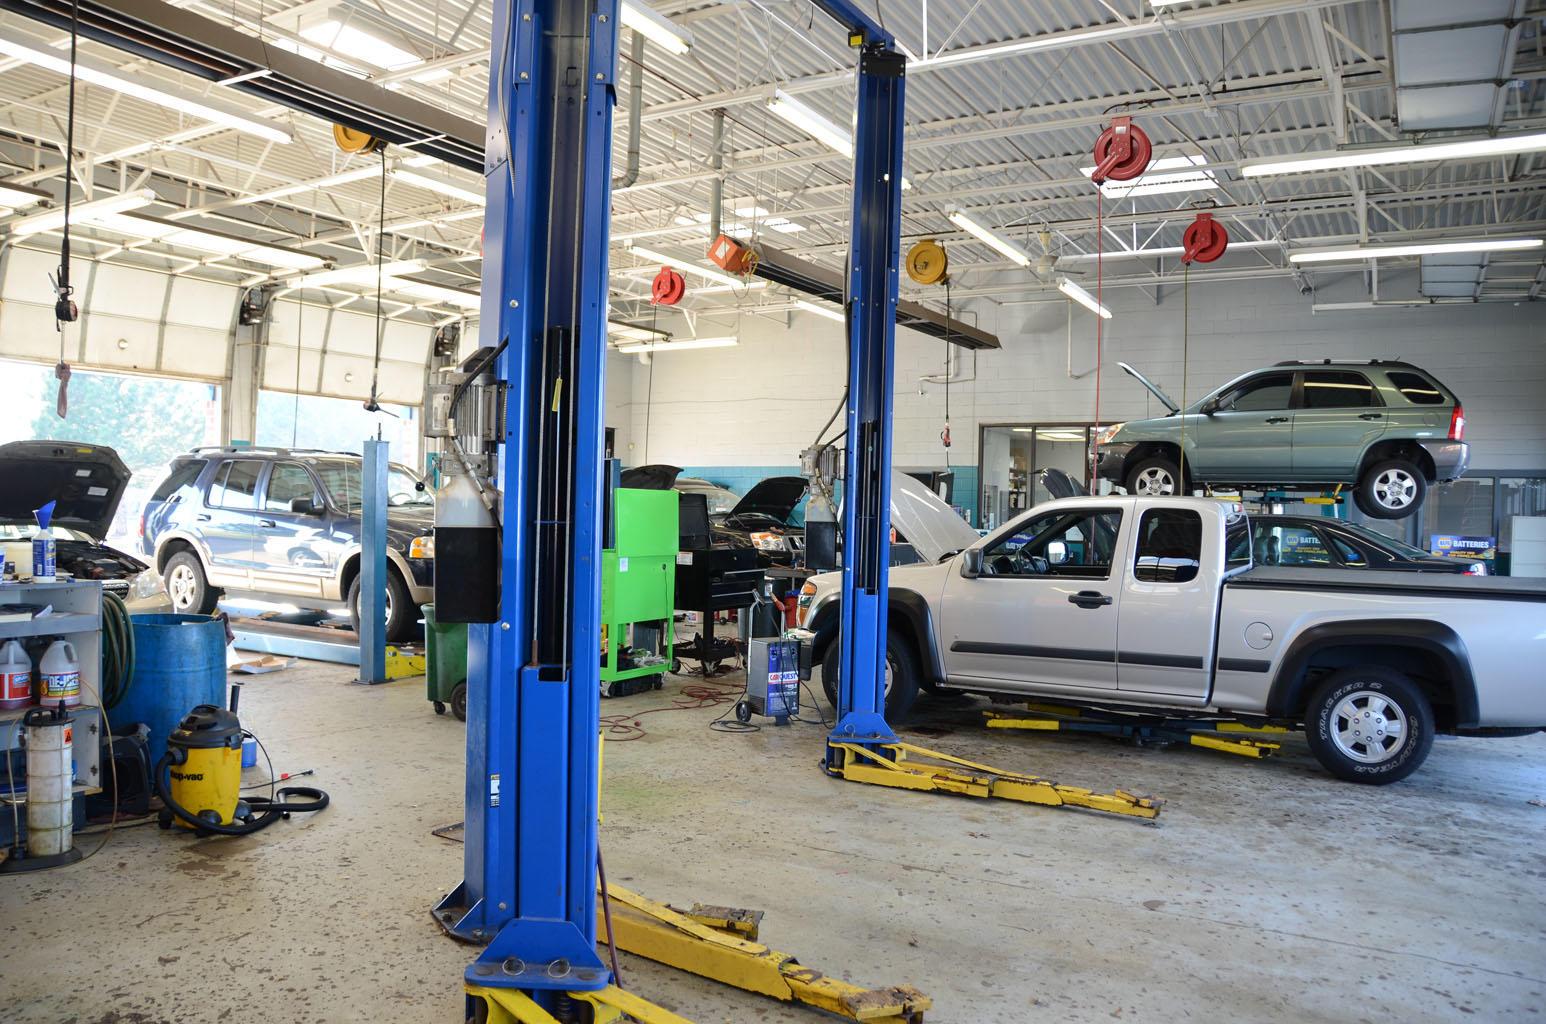 Bartel's Auto Clinic image 1